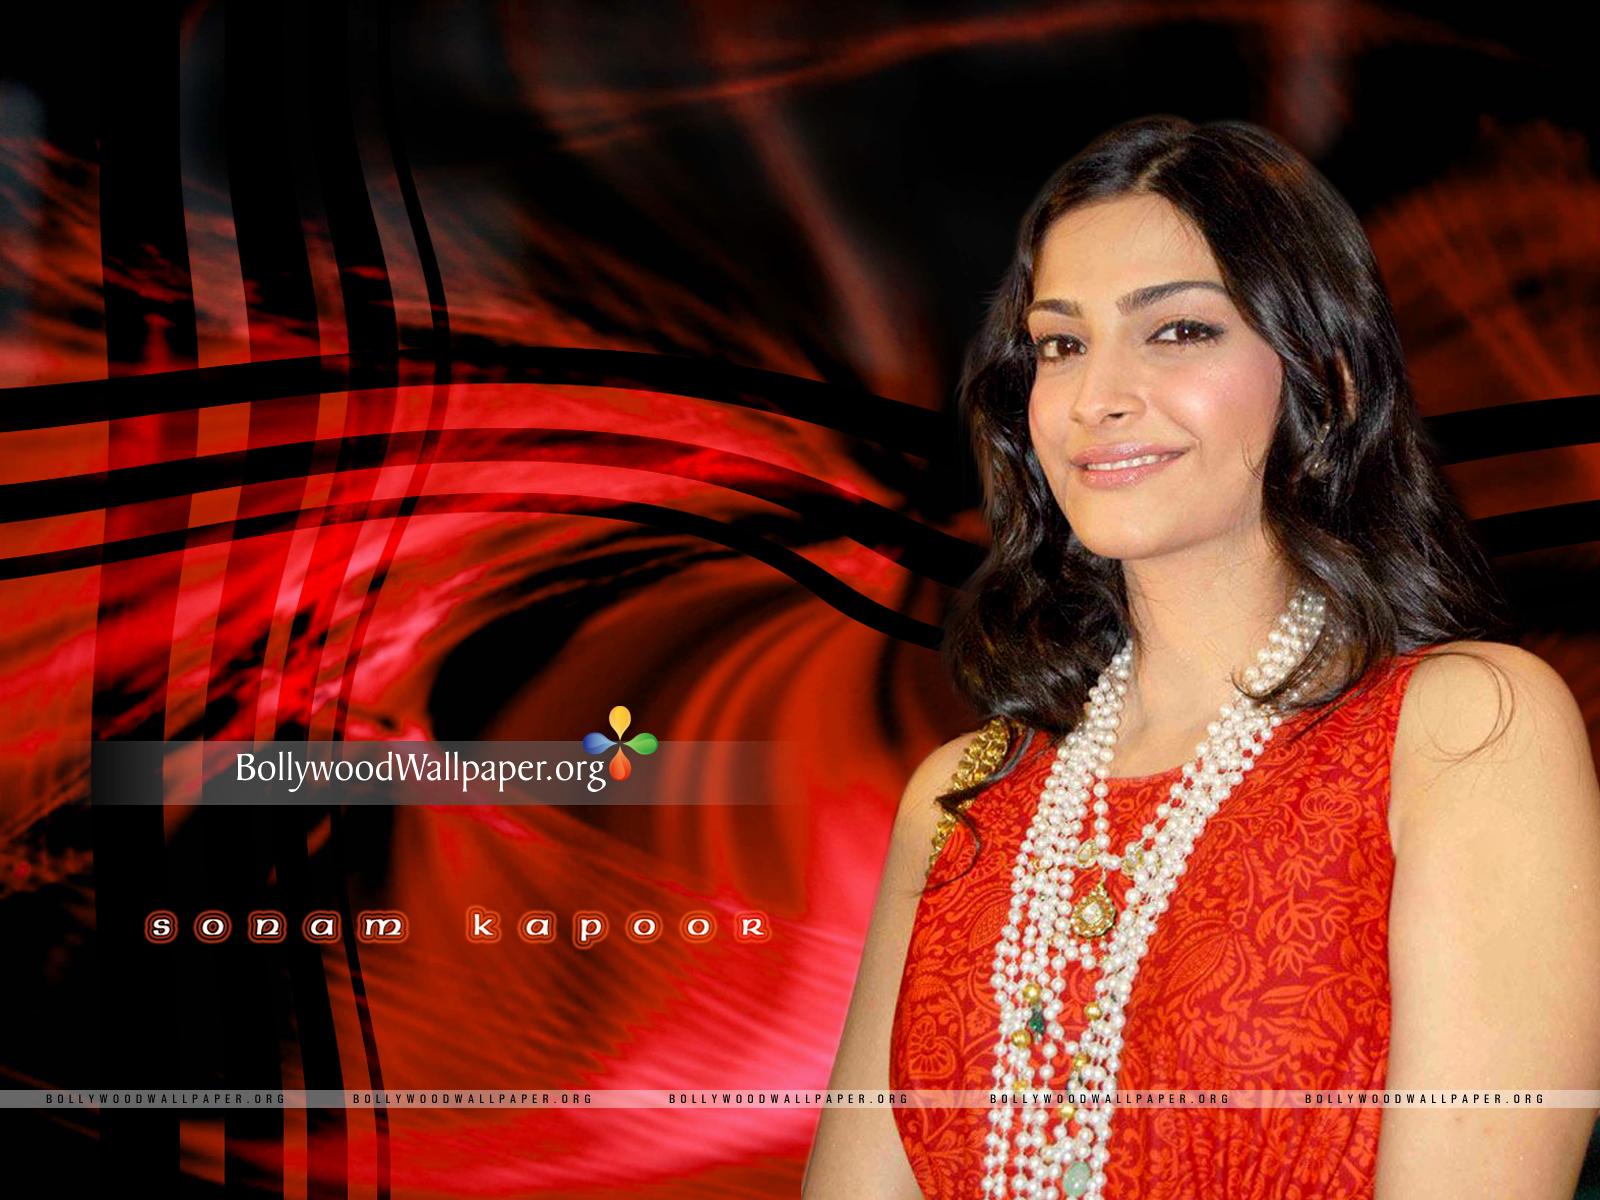 Sonam Kapoor Wallpapers: Sonam Kapoor Beautiful HD Wallpapers